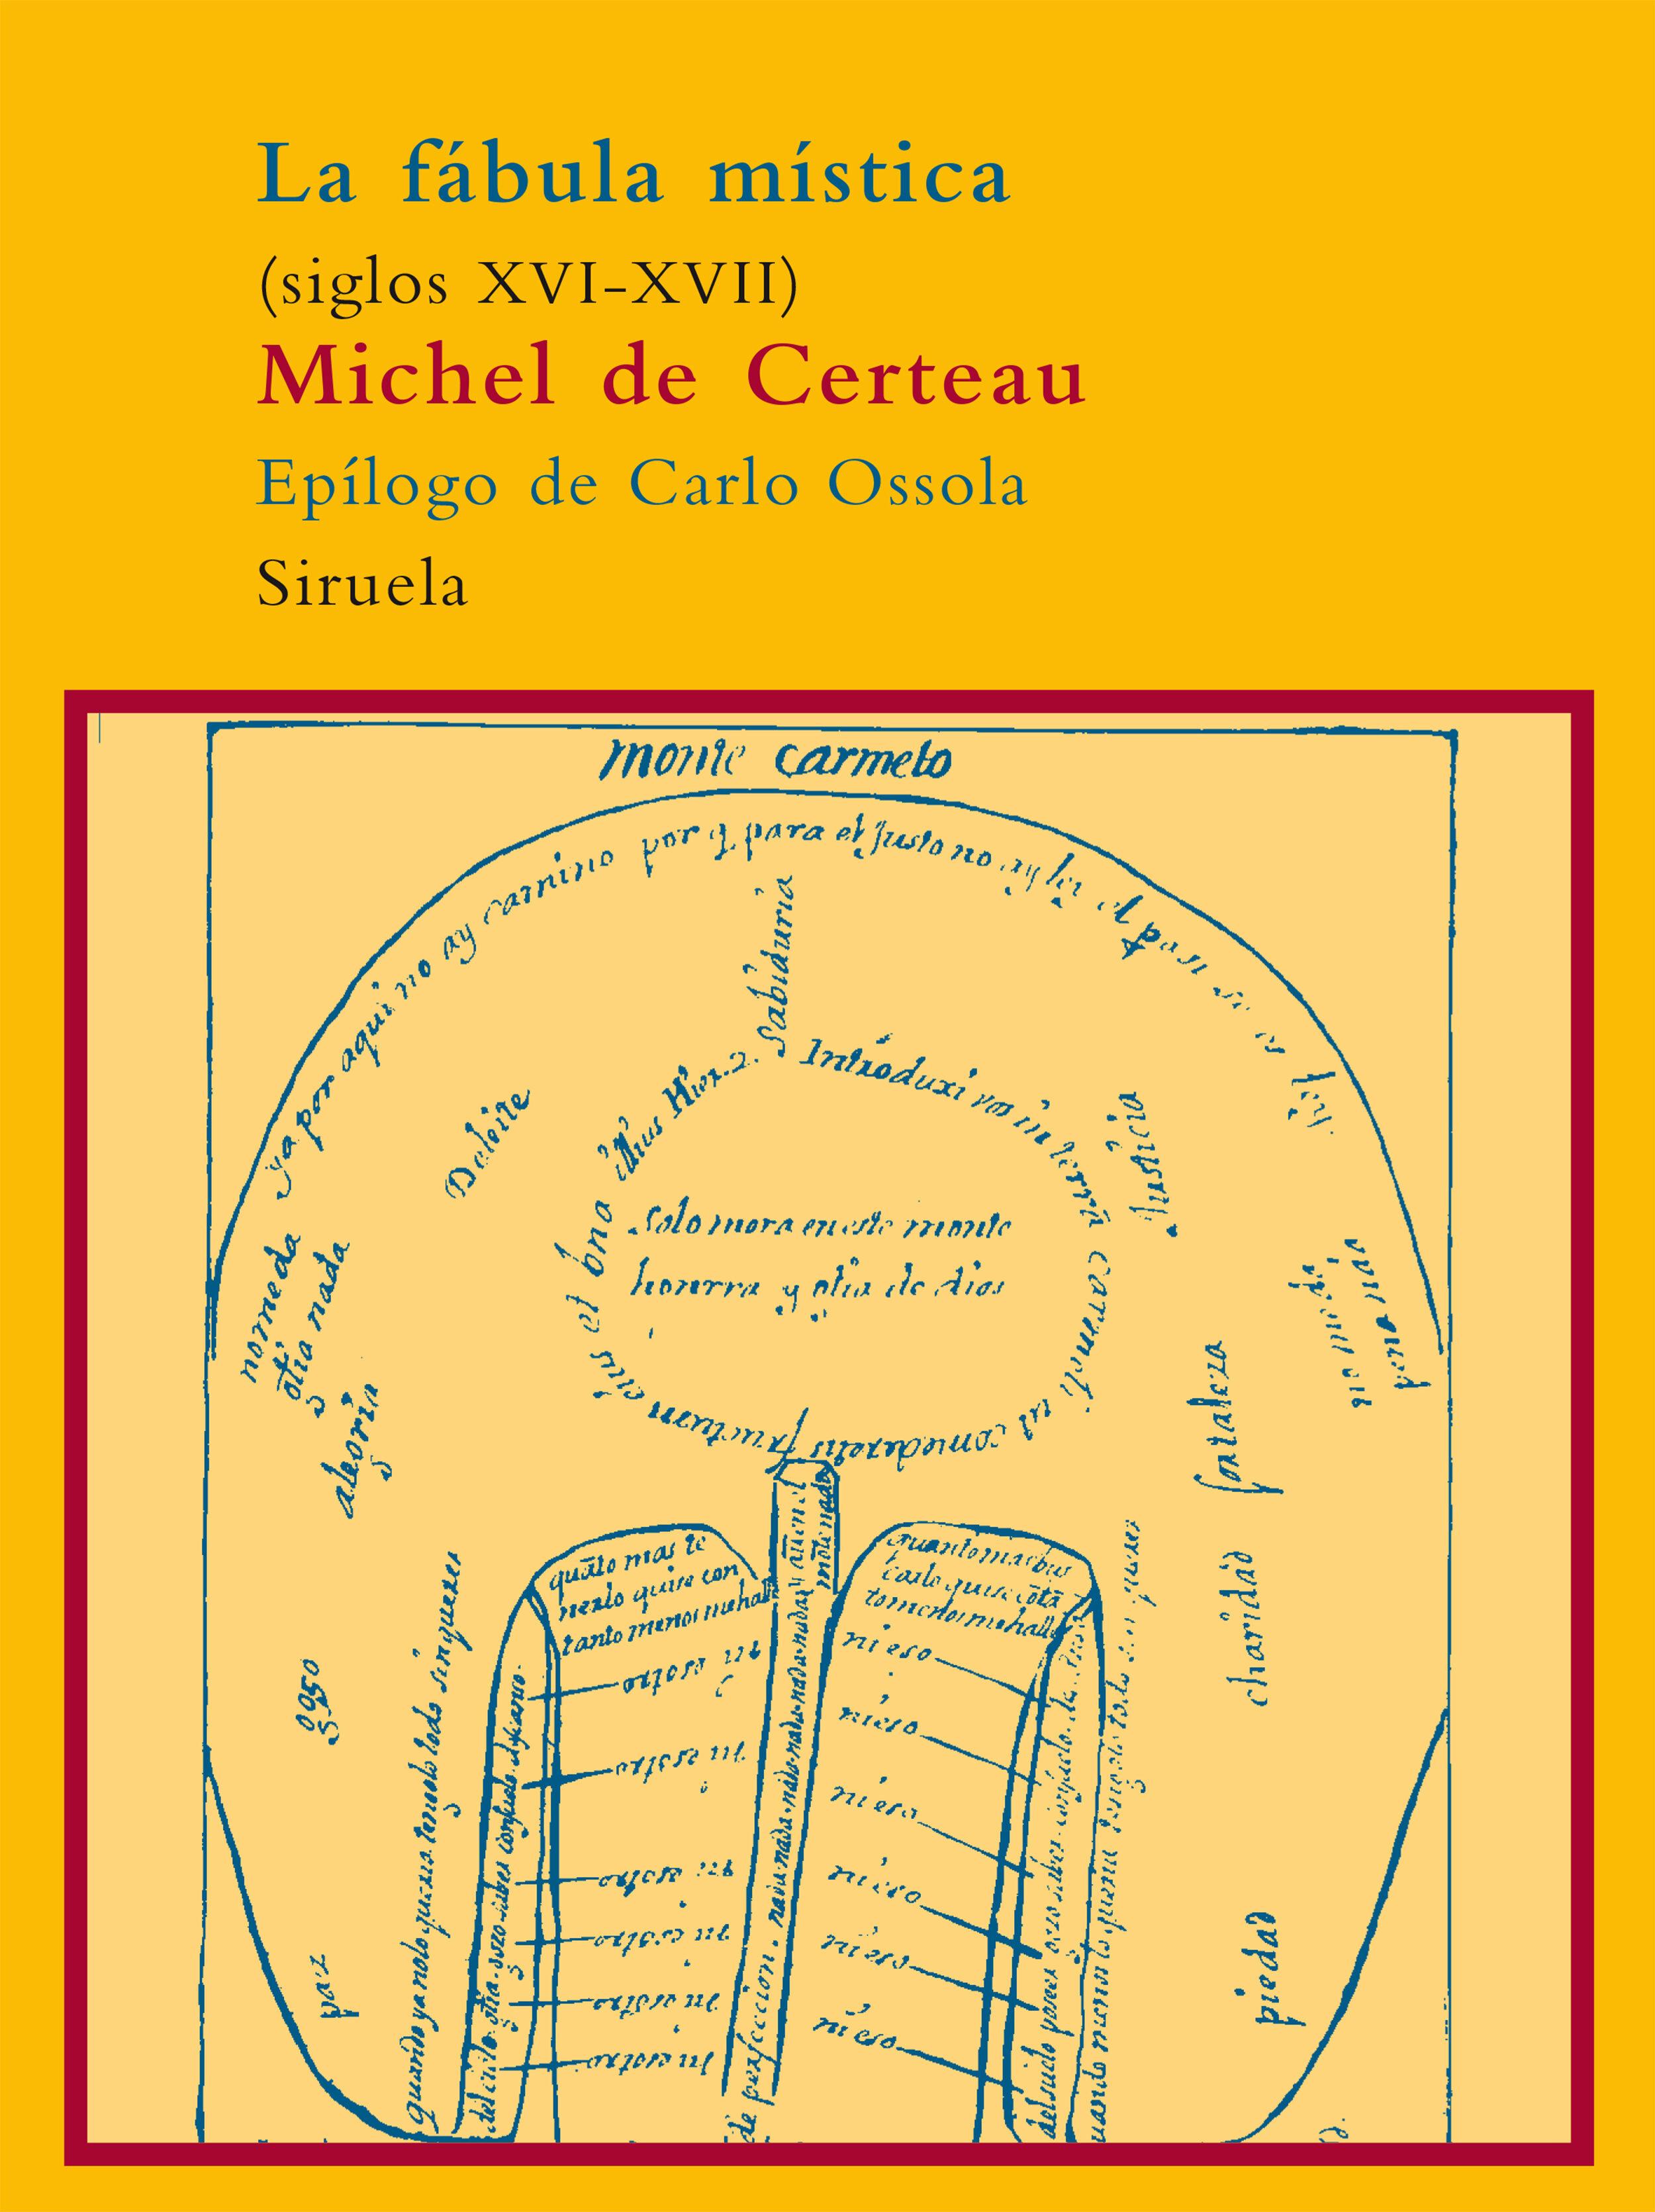 La Fabula Mistica Siglos Xvi-xvii - Certeau Michel De